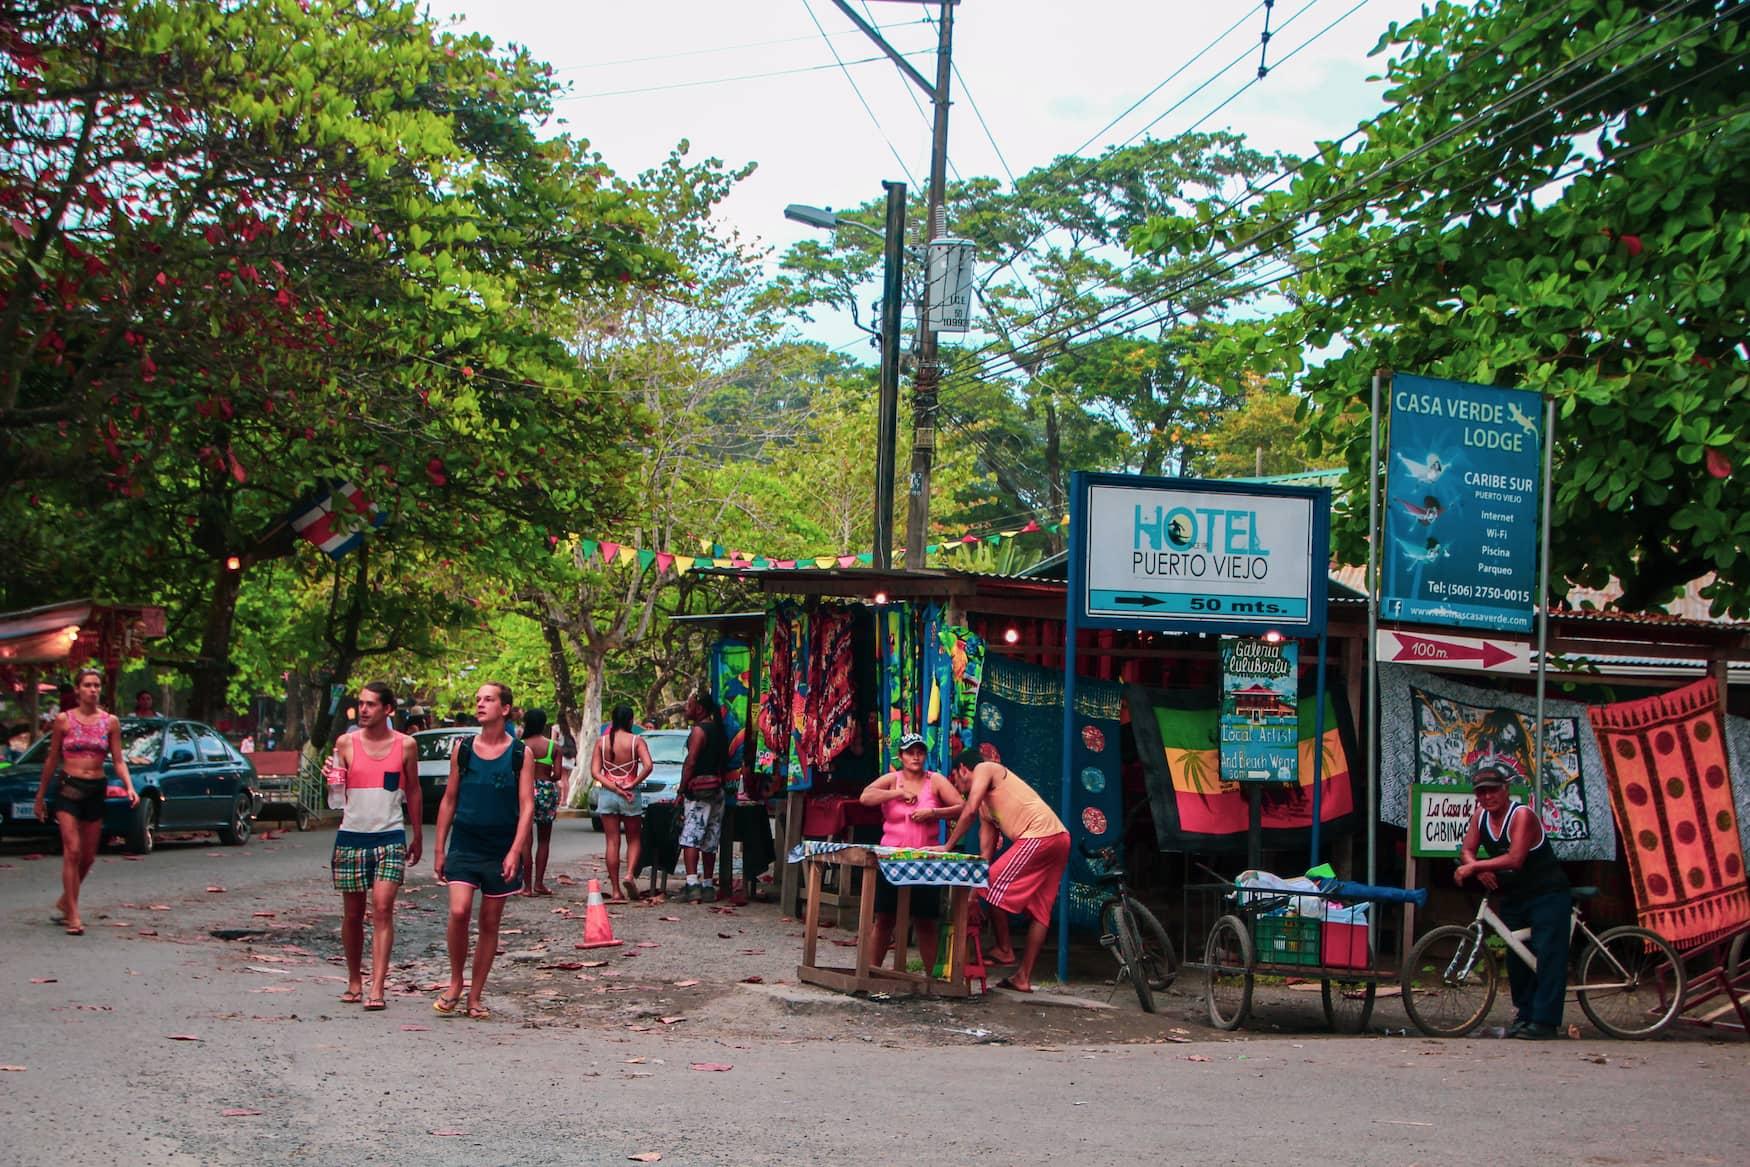 Karibisches Lebensgefühl in Puerto Viejo, Costa Rica